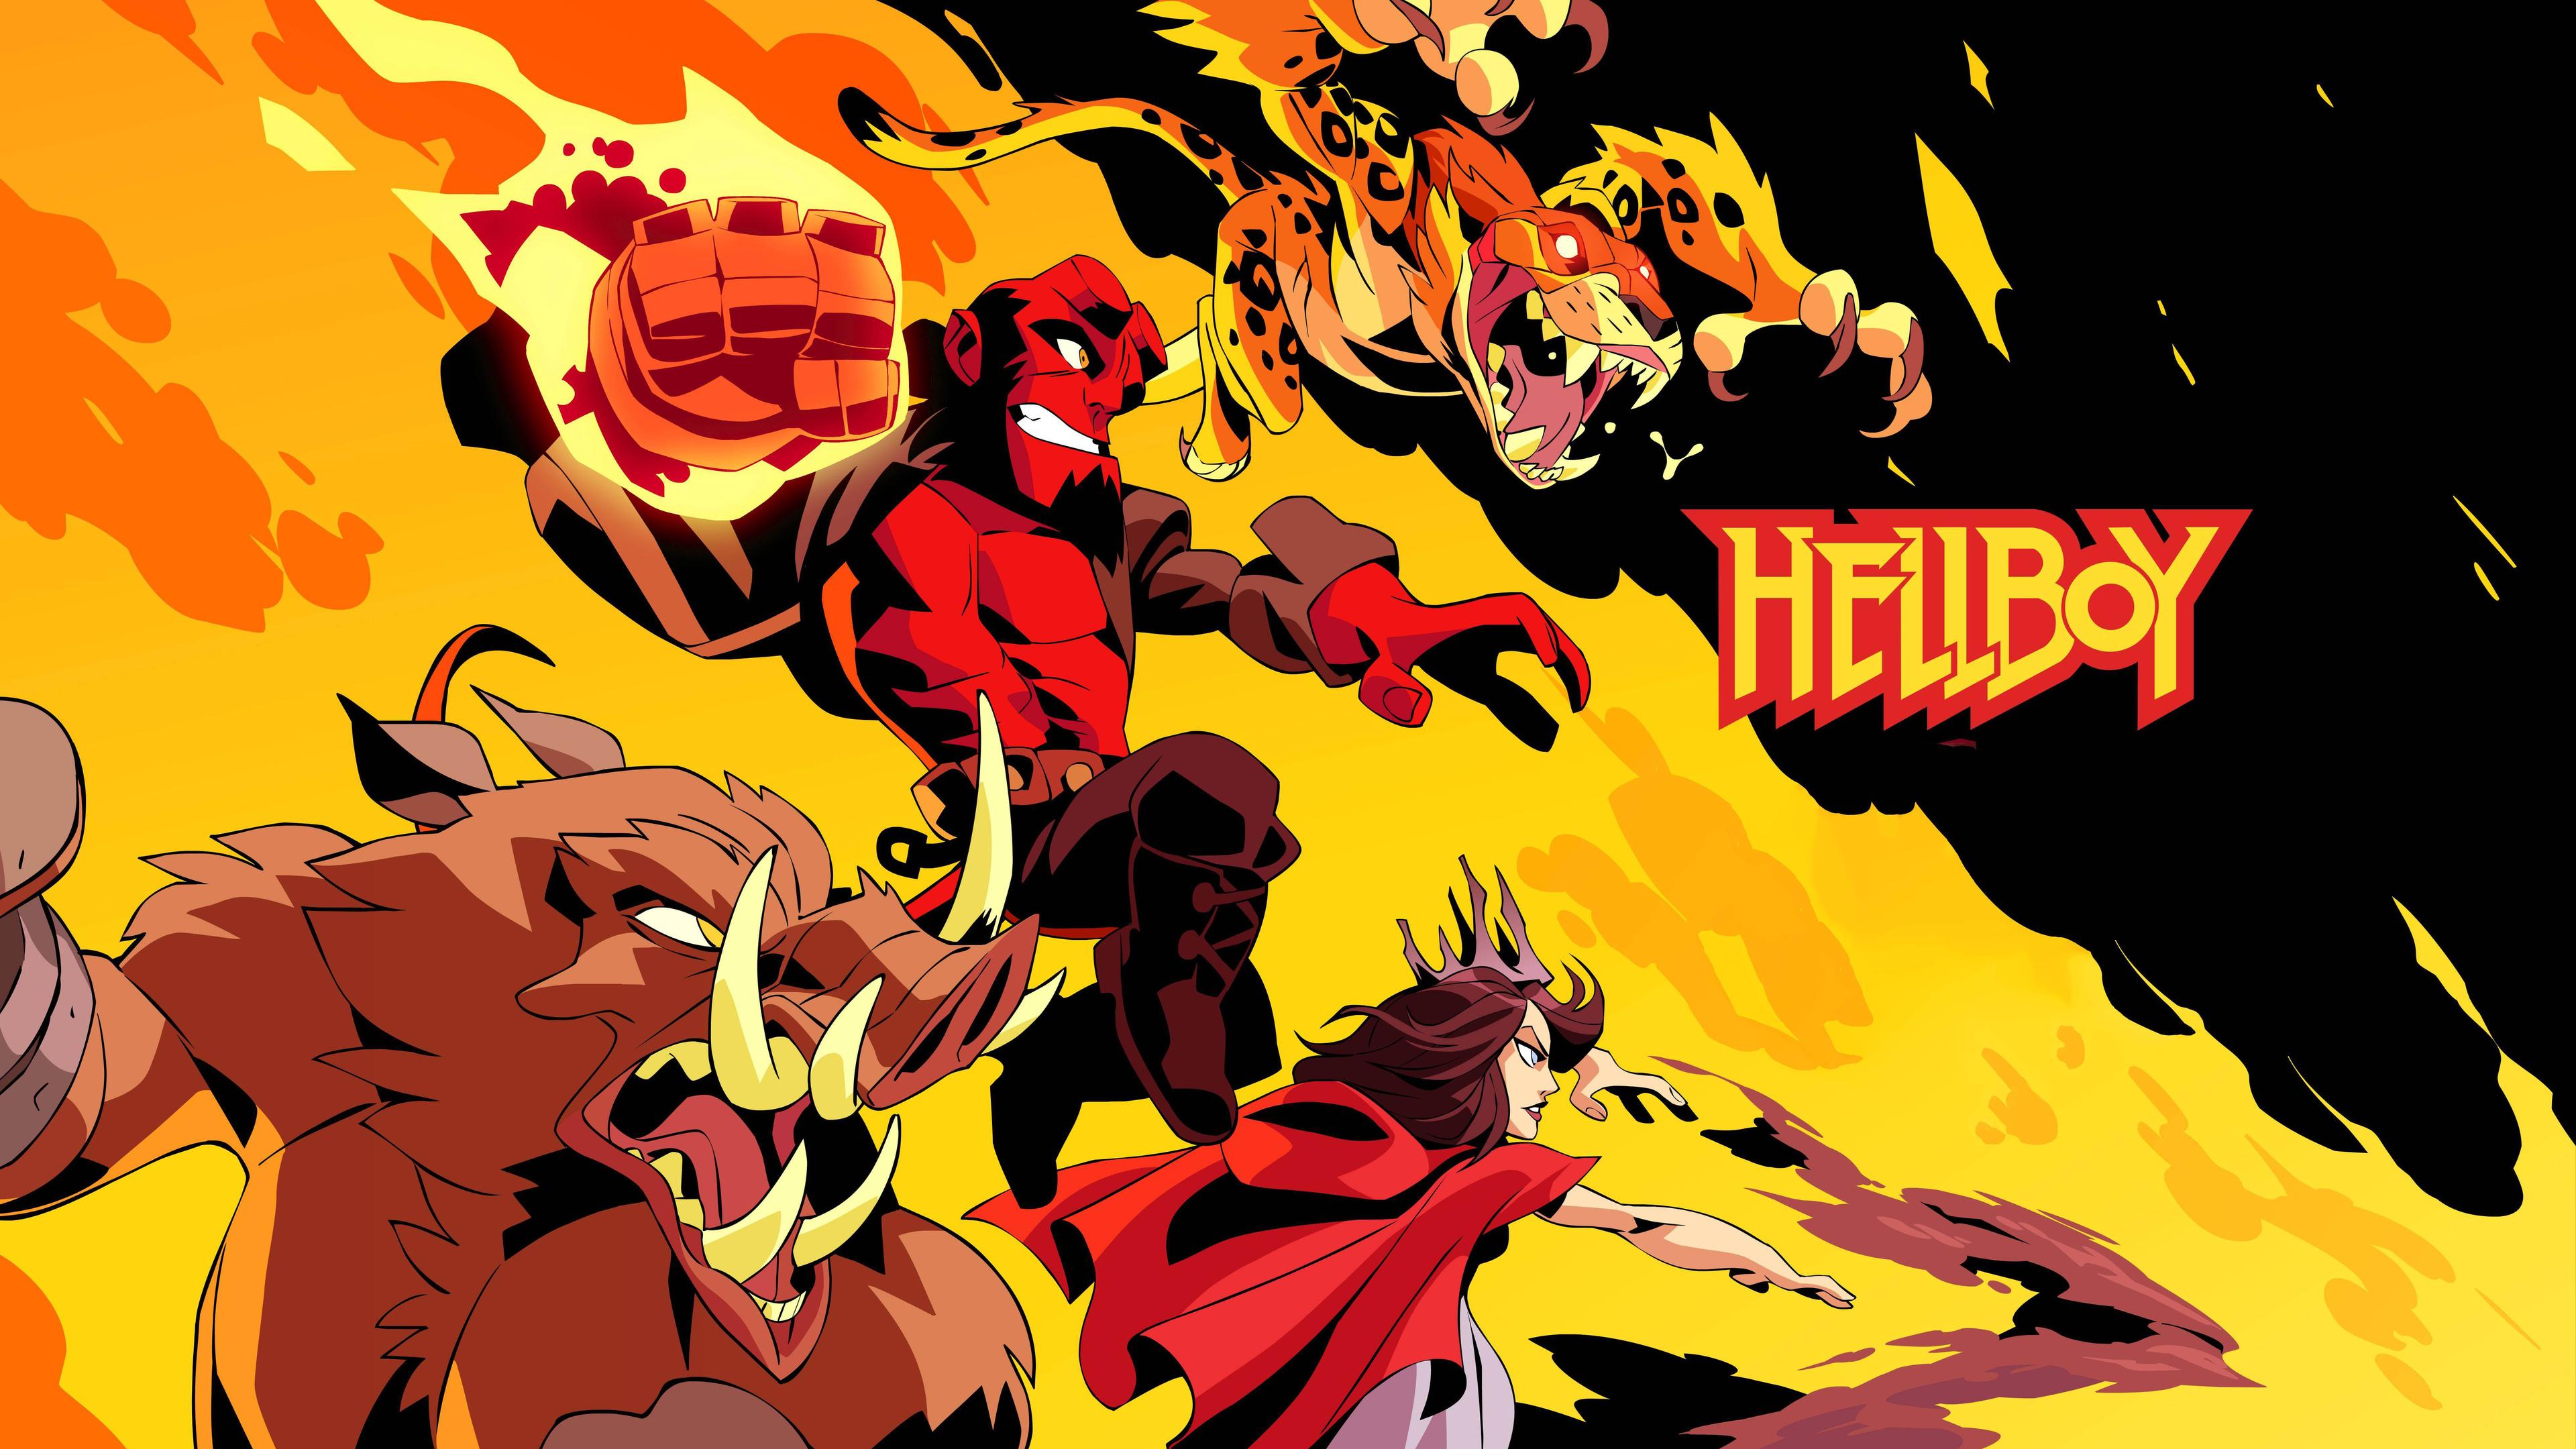 hellboy artwork 4k 1554244961 - Hellboy Artwork 4k - superheroes wallpapers, hellboy wallpapers, hd-wallpapers, artwork wallpapers, 8k wallpapers, 5k wallpapers, 4k-wallpapers